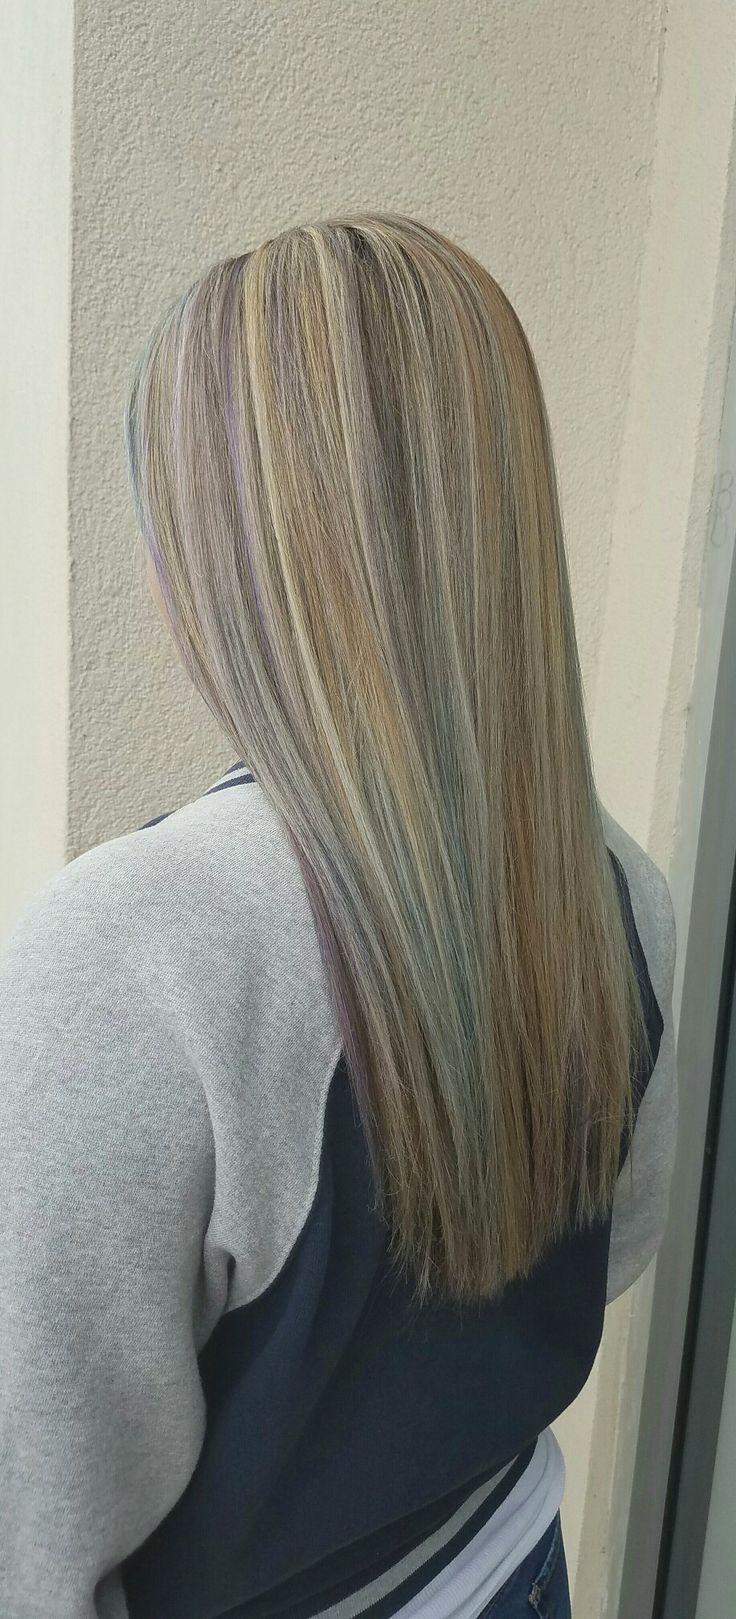 Hair by Evy. Torrance  California  424 215-8362